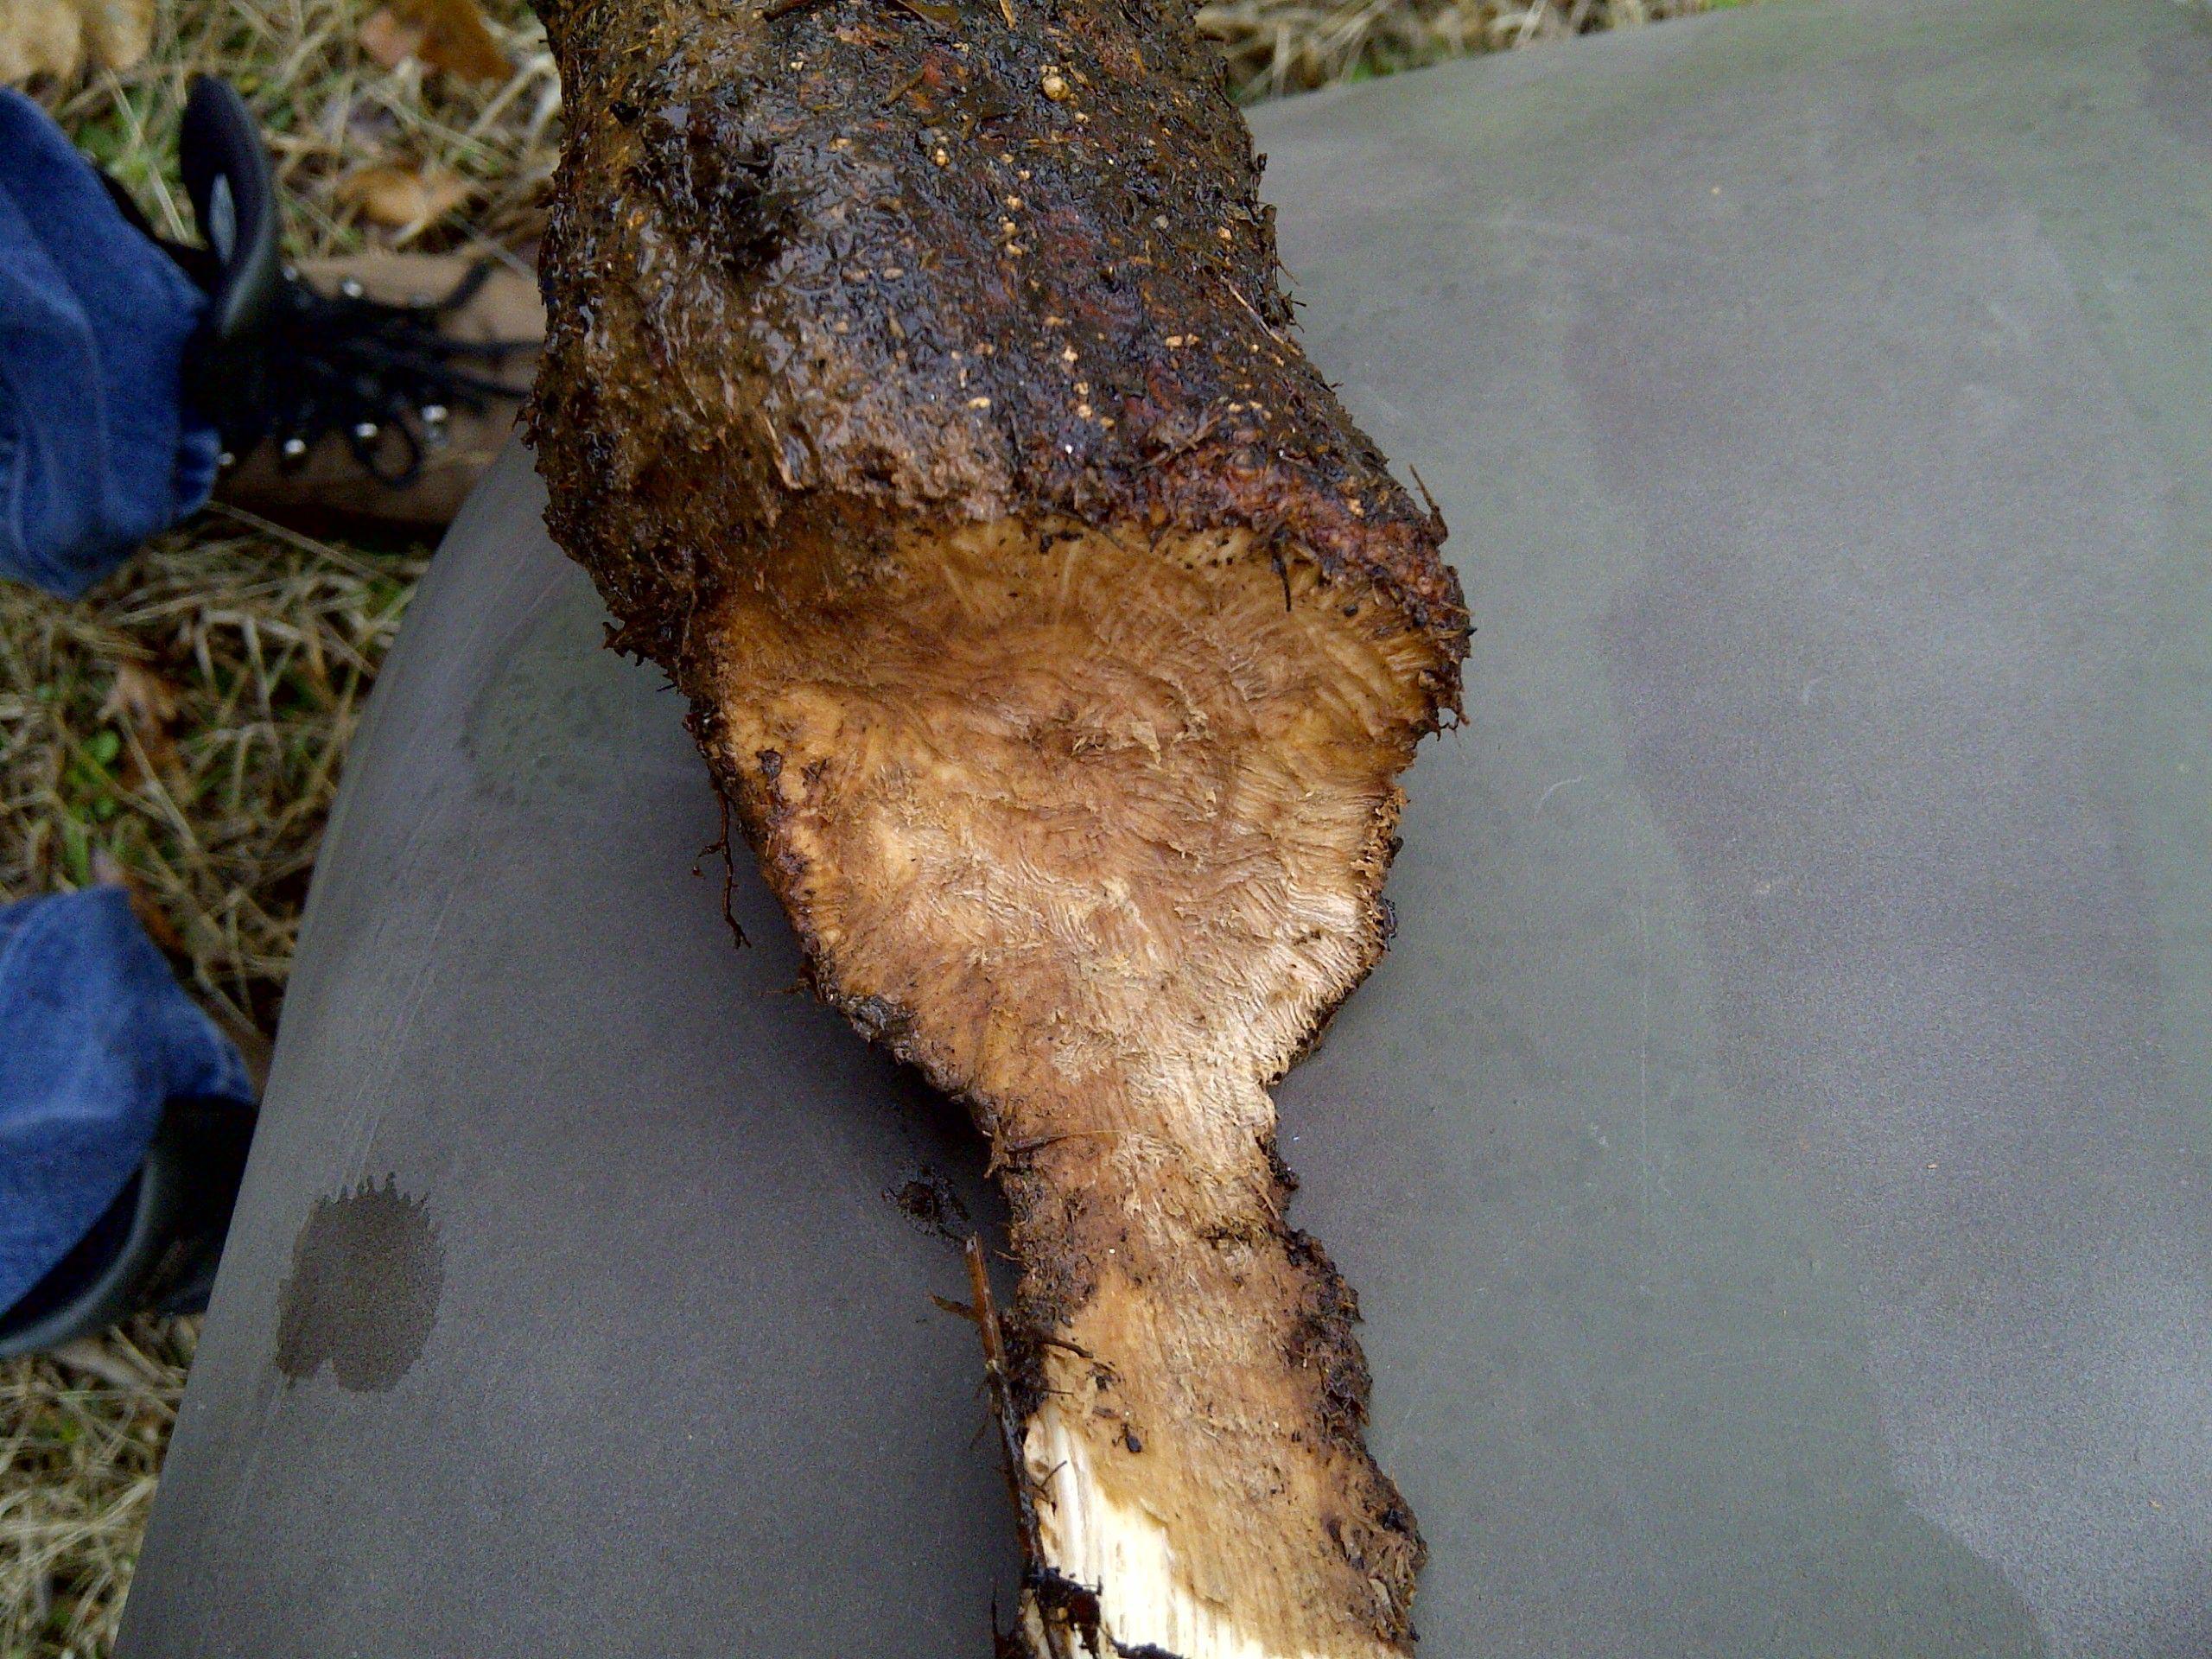 vole damage to oak